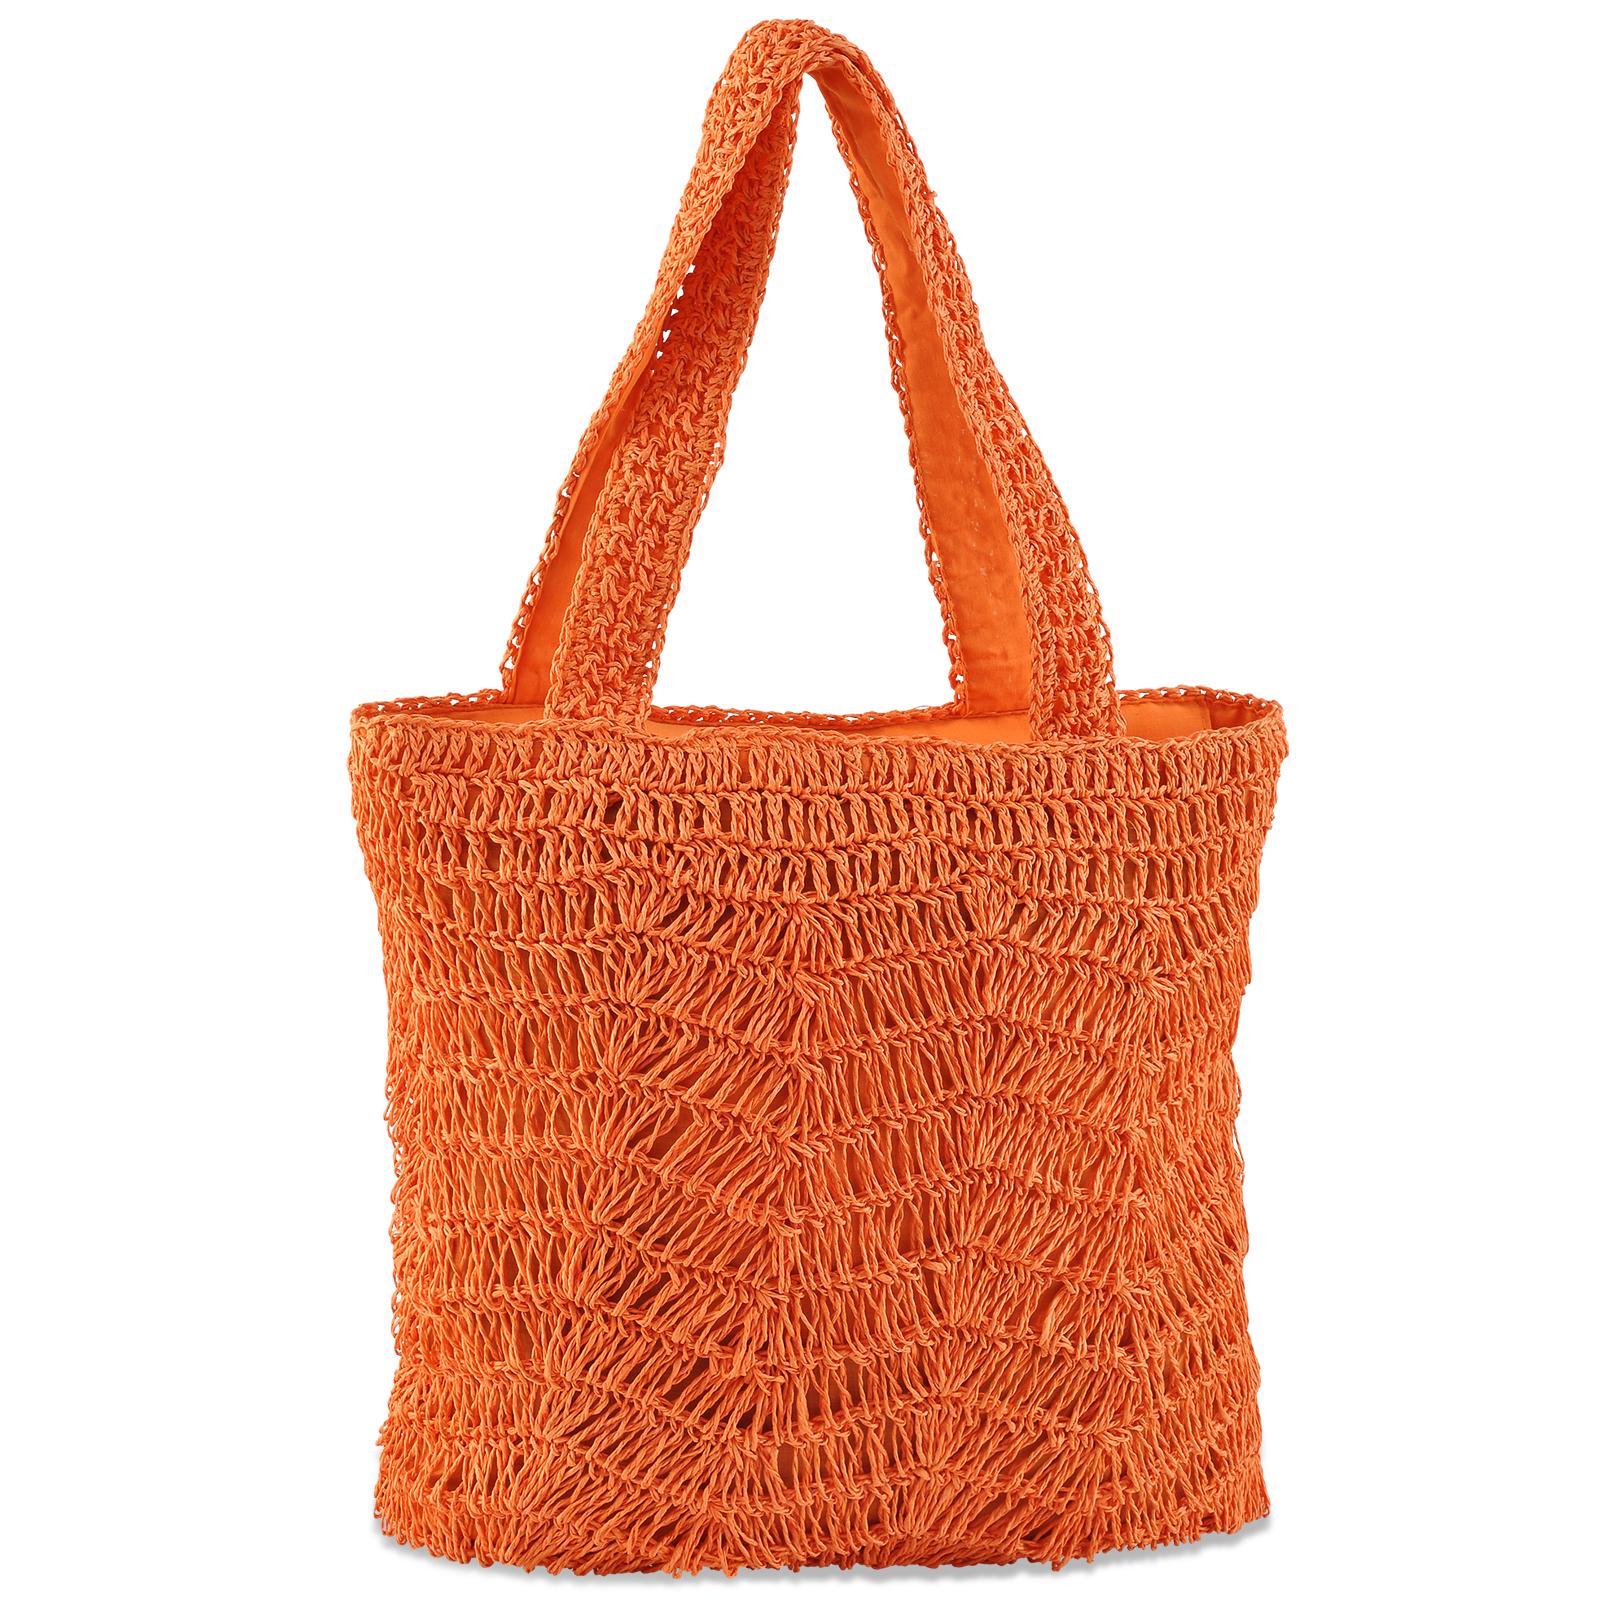 sac-plage-orange-MQ-00043-F16